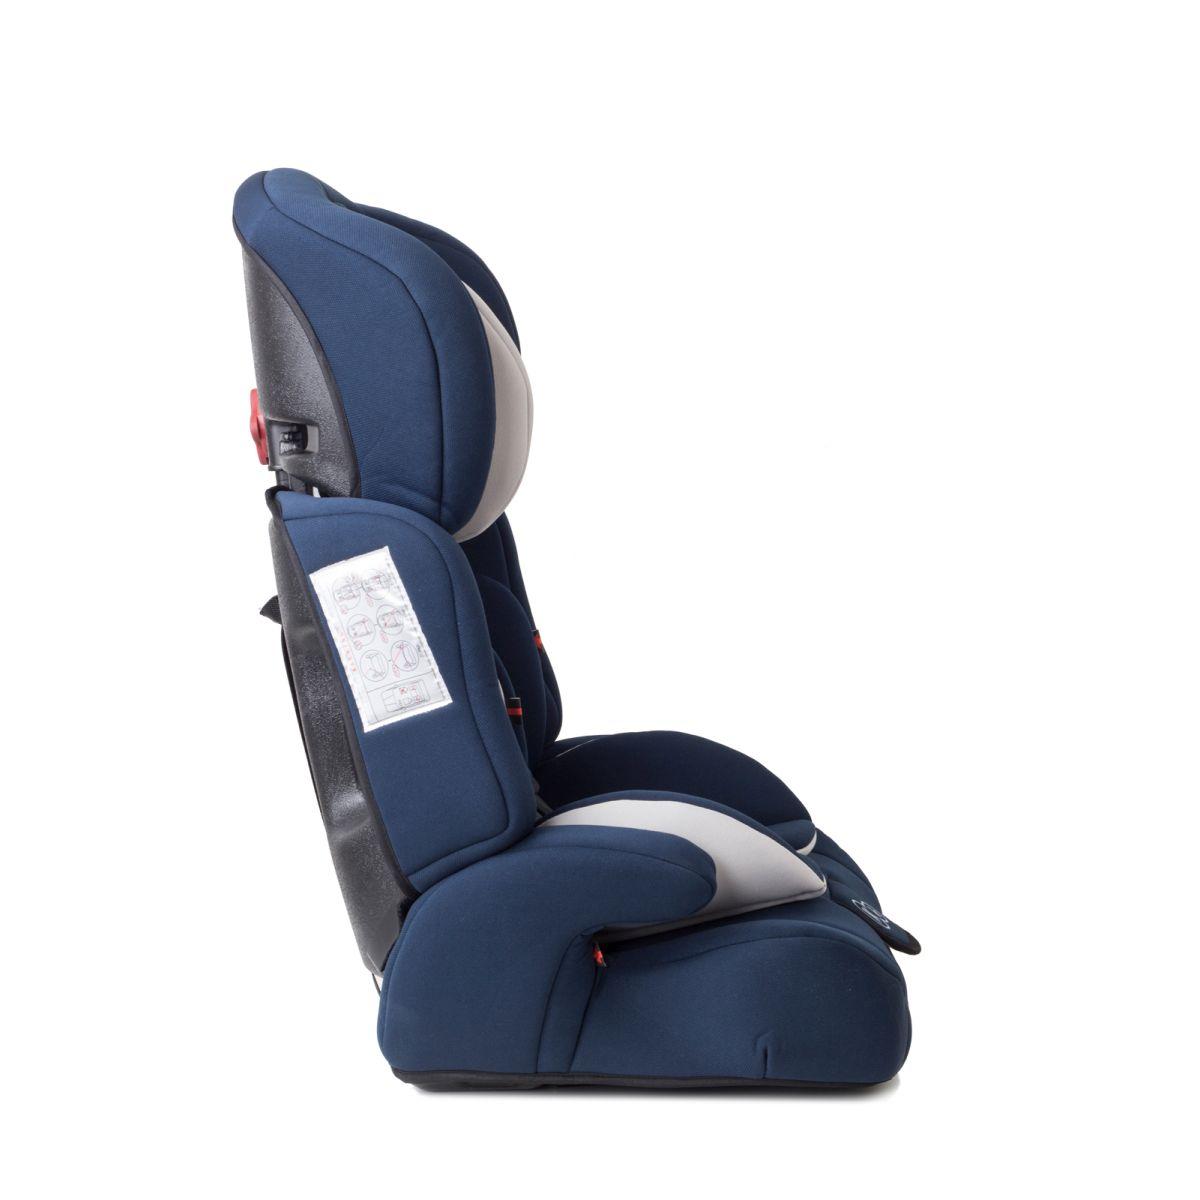 autokindersitz kinderautositz kindersitz 9 bis 36 kg comfort up dunkelblau neu ebay. Black Bedroom Furniture Sets. Home Design Ideas